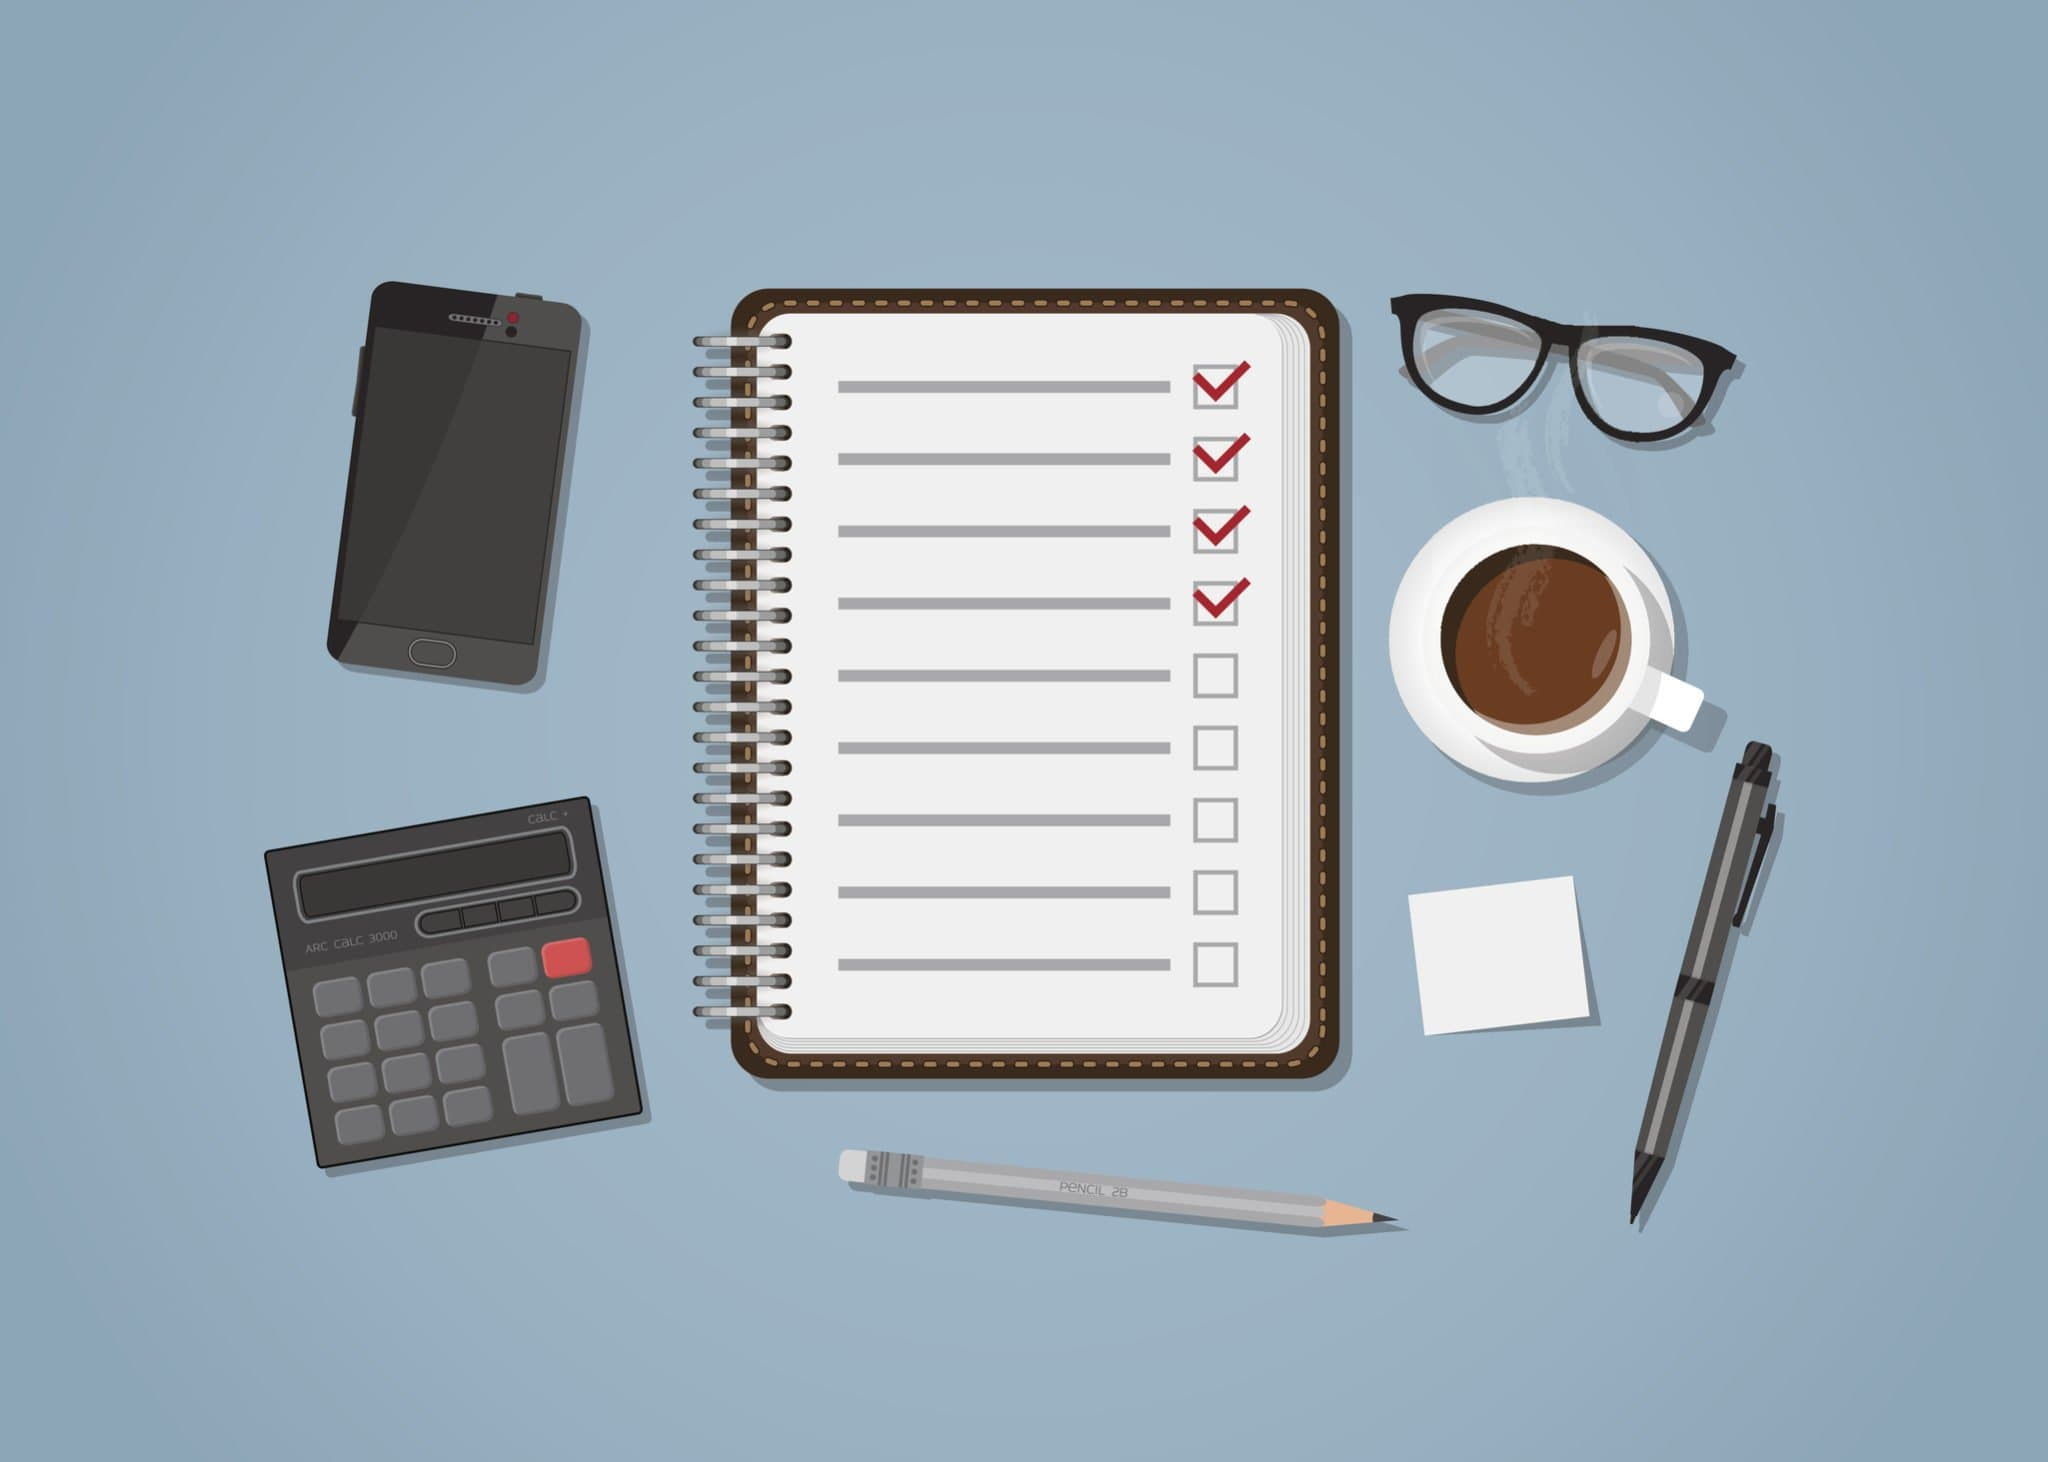 end-of-year-payroll-checklist